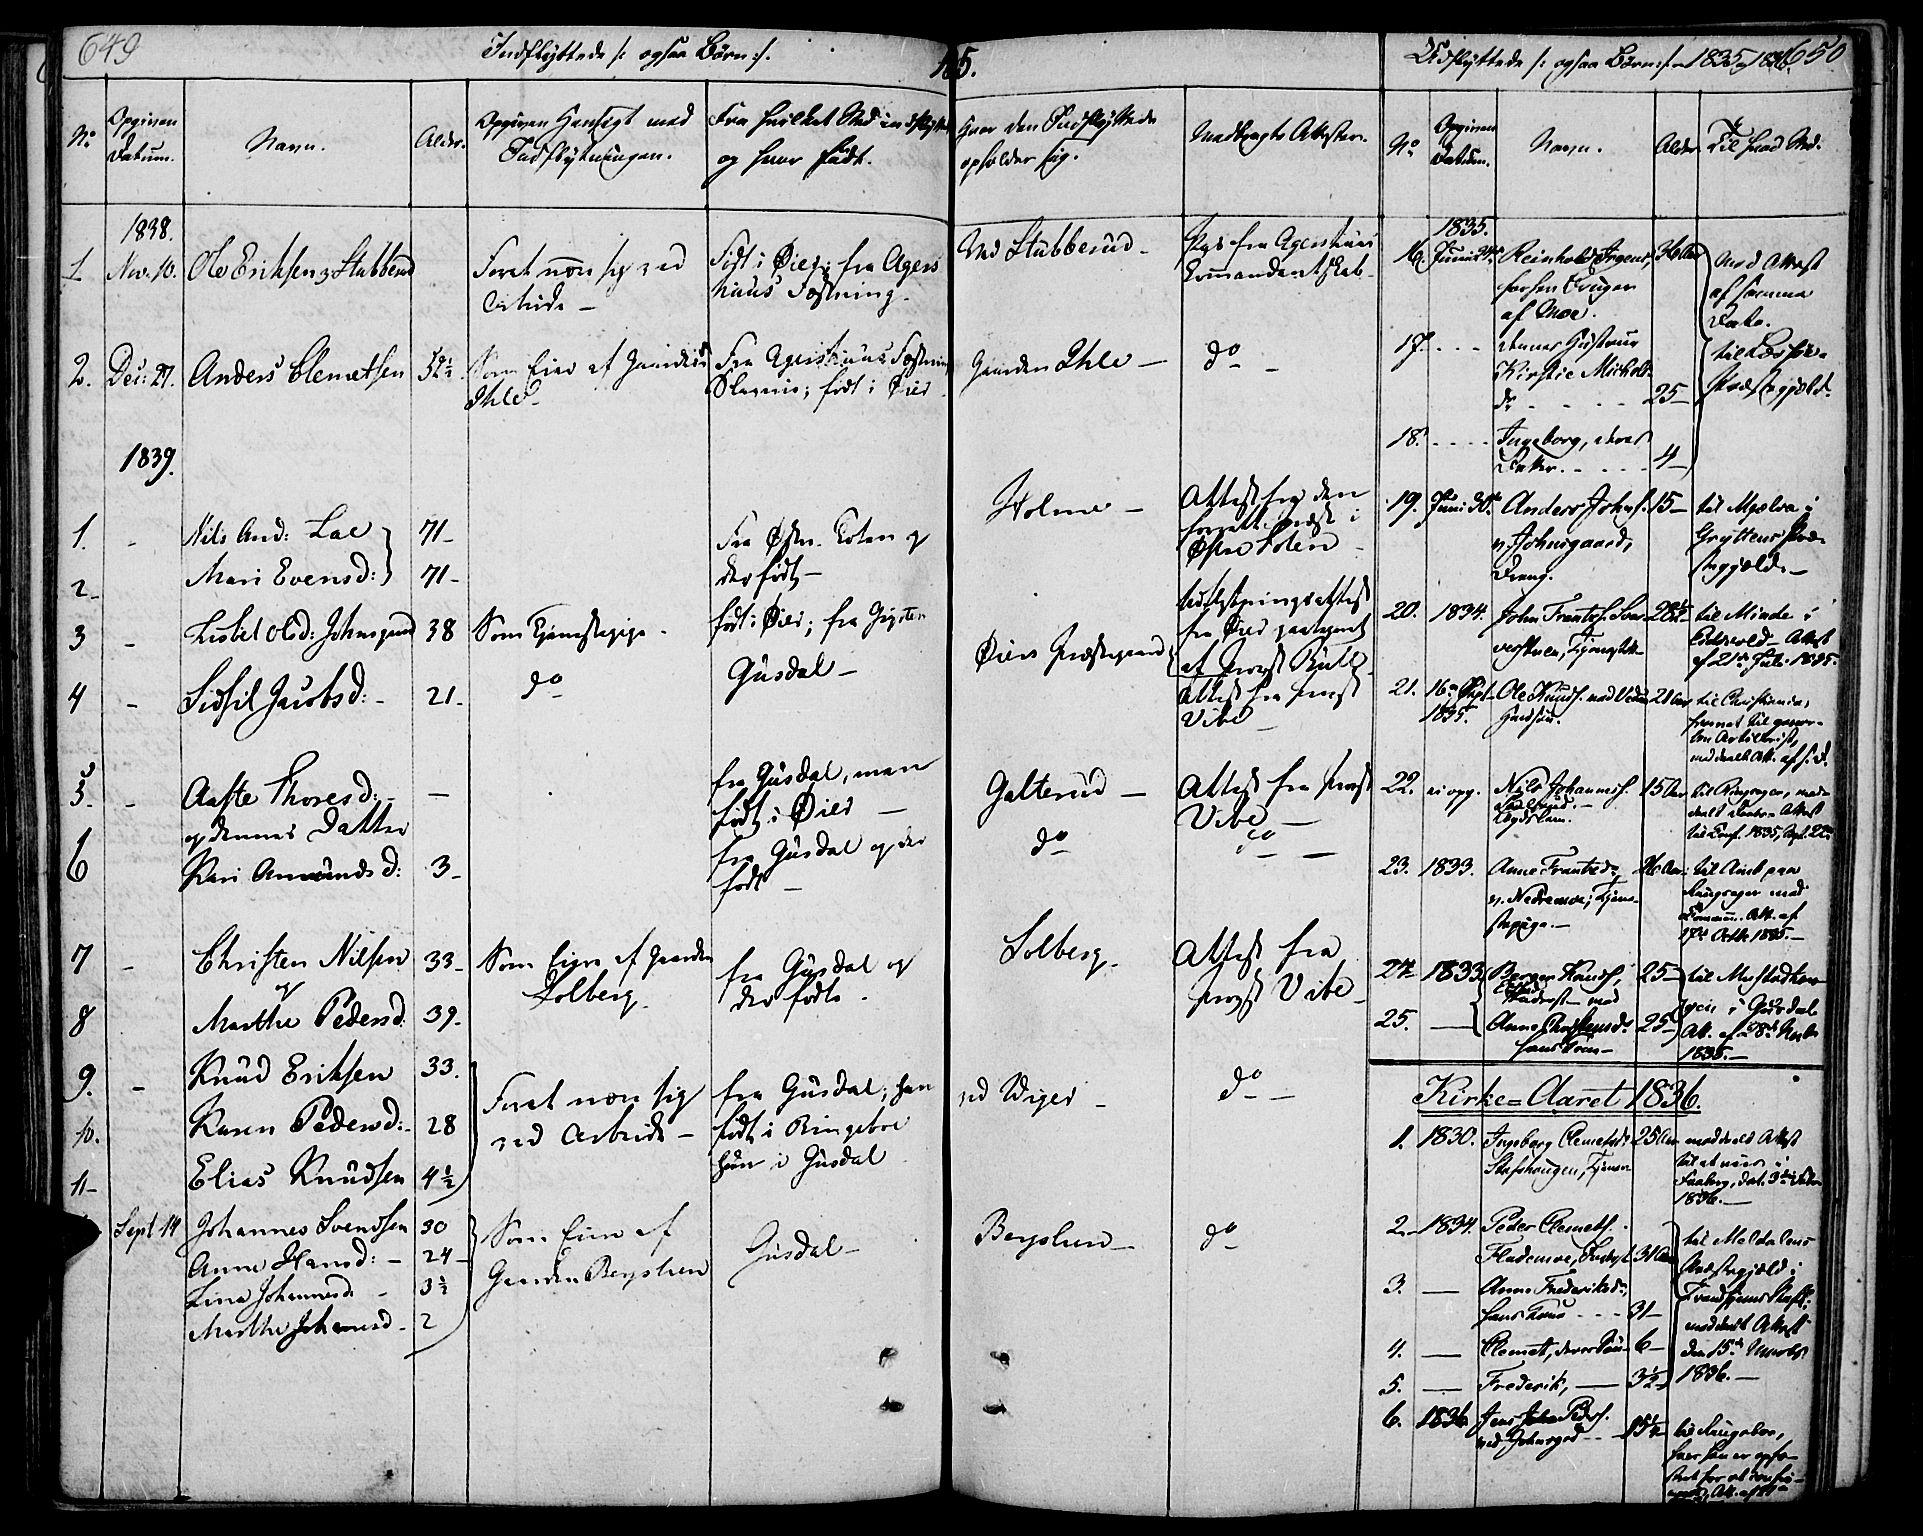 SAH, Øyer prestekontor, Ministerialbok nr. 4, 1824-1841, s. 649-650